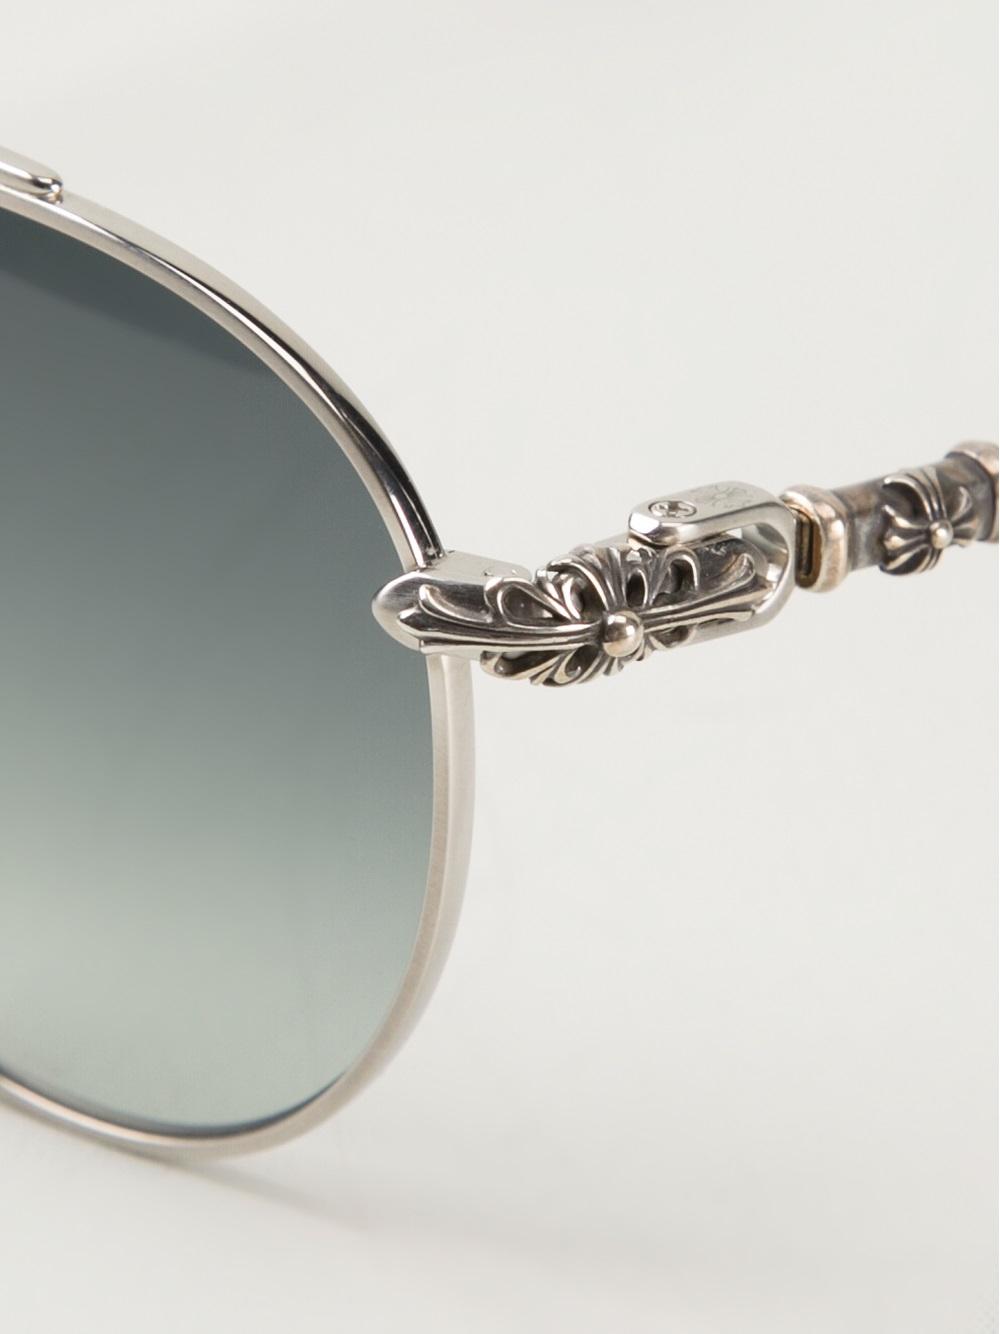 chrome hearts sunglasses  chrome hearts sunglasses